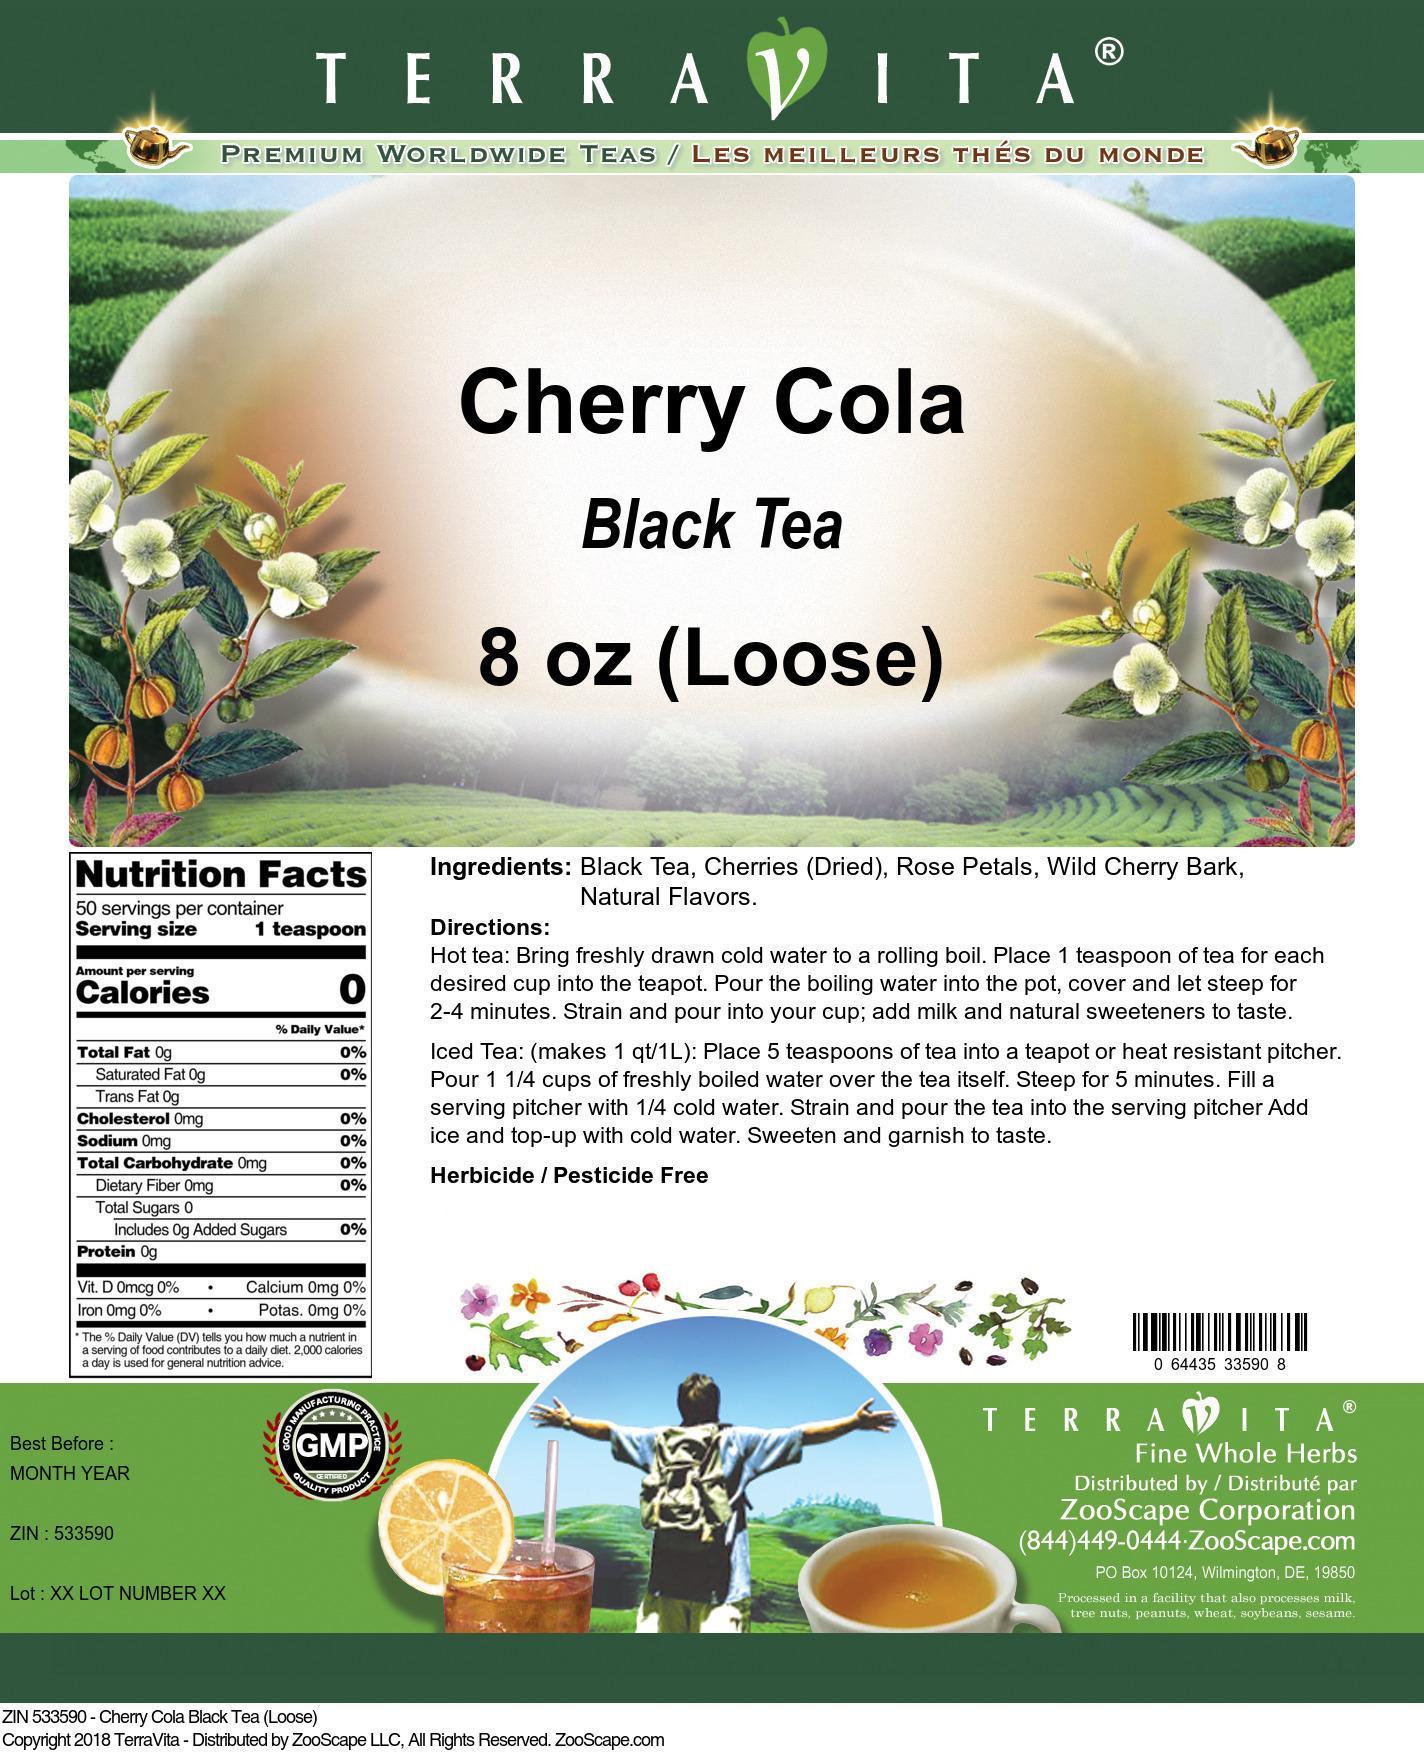 Cherry Cola Black Tea (Loose)